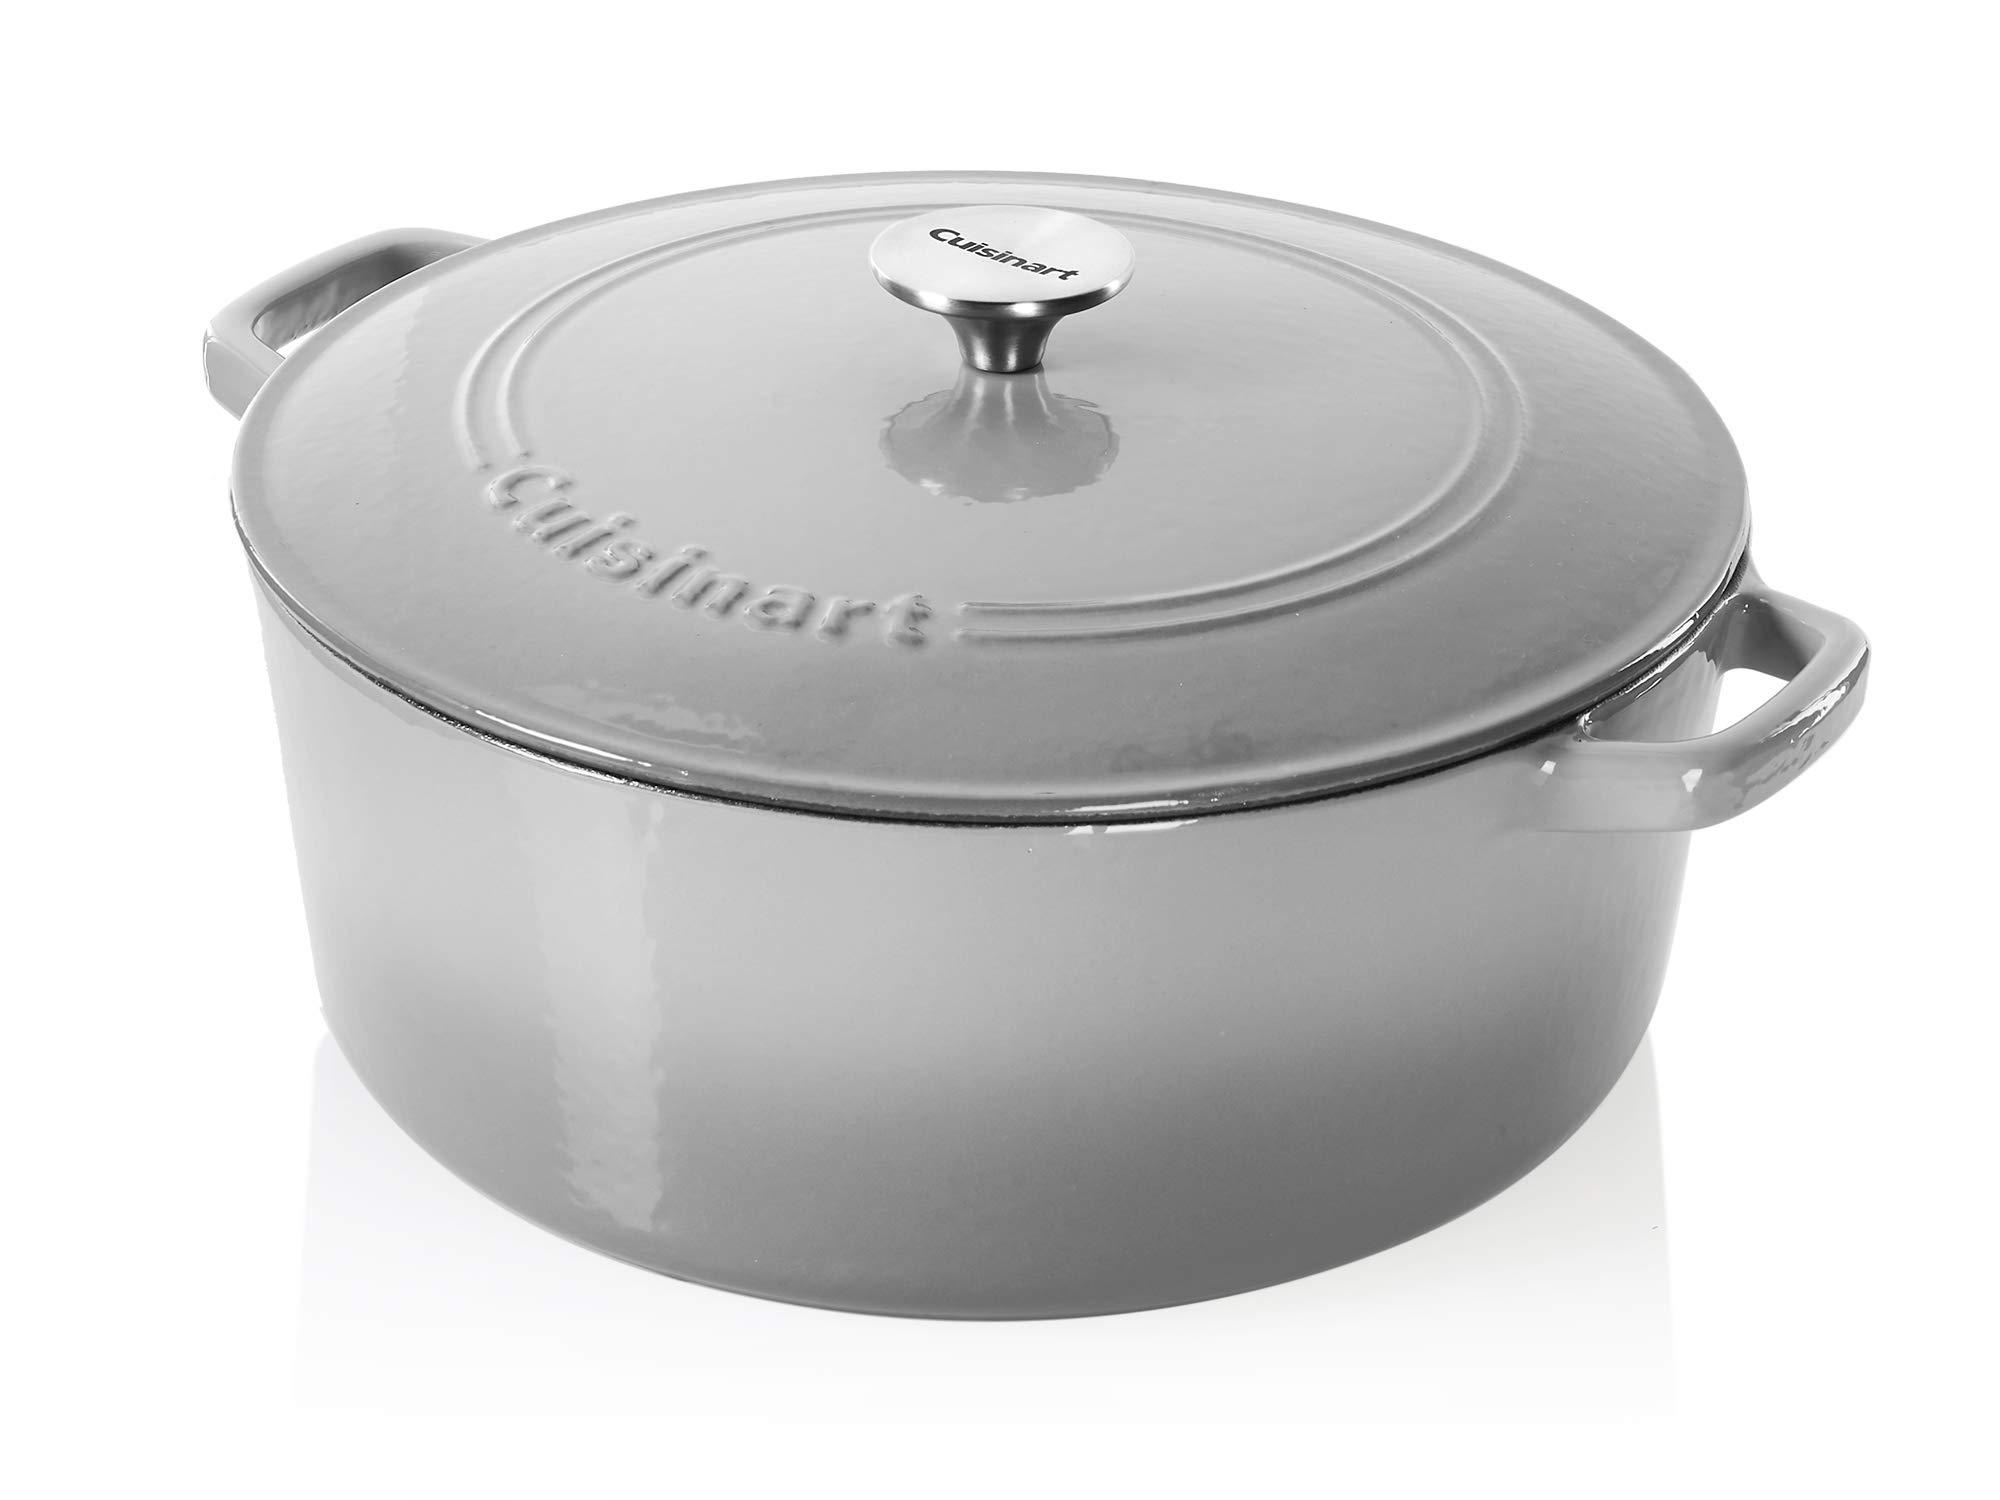 Cuisinart Cast Iron Casserole, Grey Gradient, 7-Quart